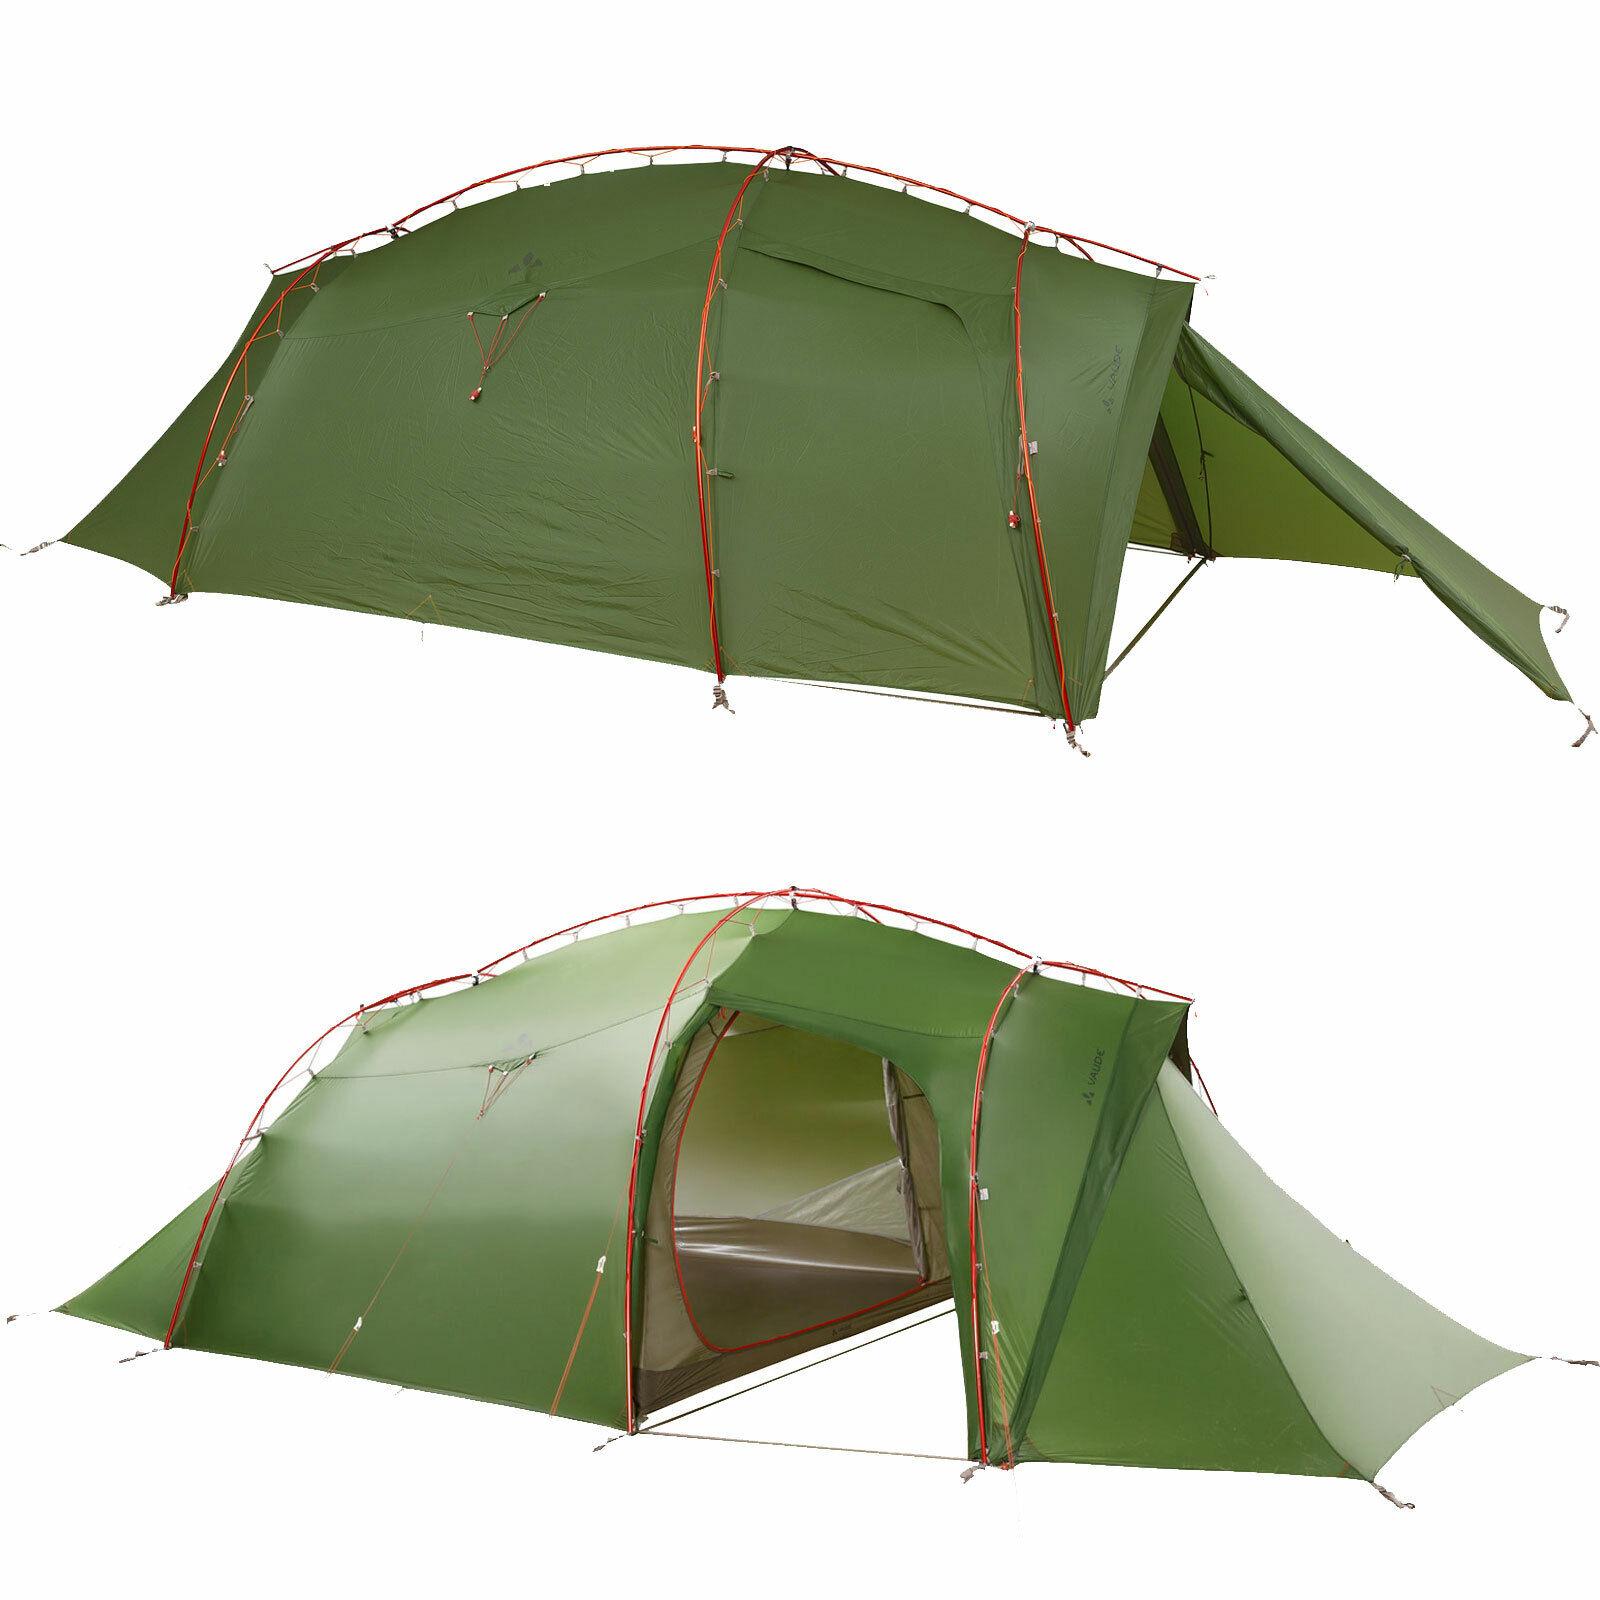 Vaude Mark XT Tent Hybridzelt  Mehrpersonenzelt Dome Tent Tunnel Tent Outdoor  big sale